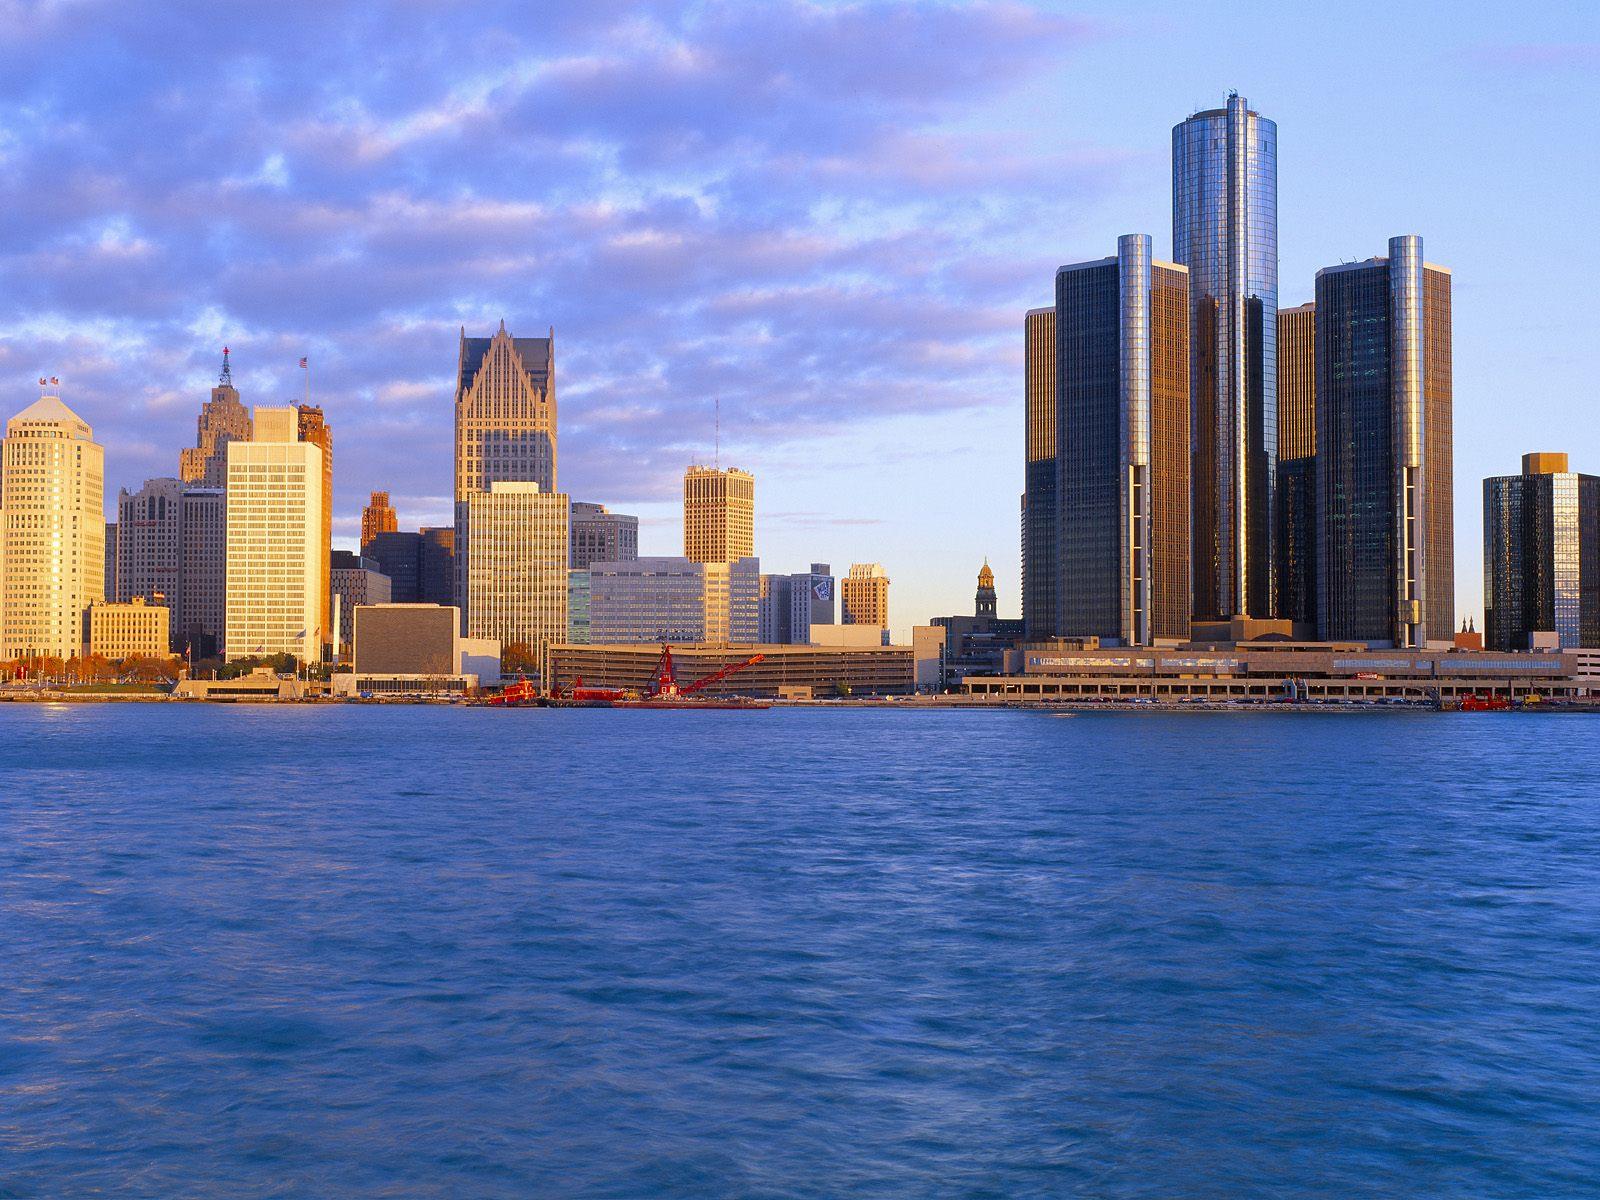 Detroit at Sunrise Michigan Wallpapers HD Wallpapers 1600x1200